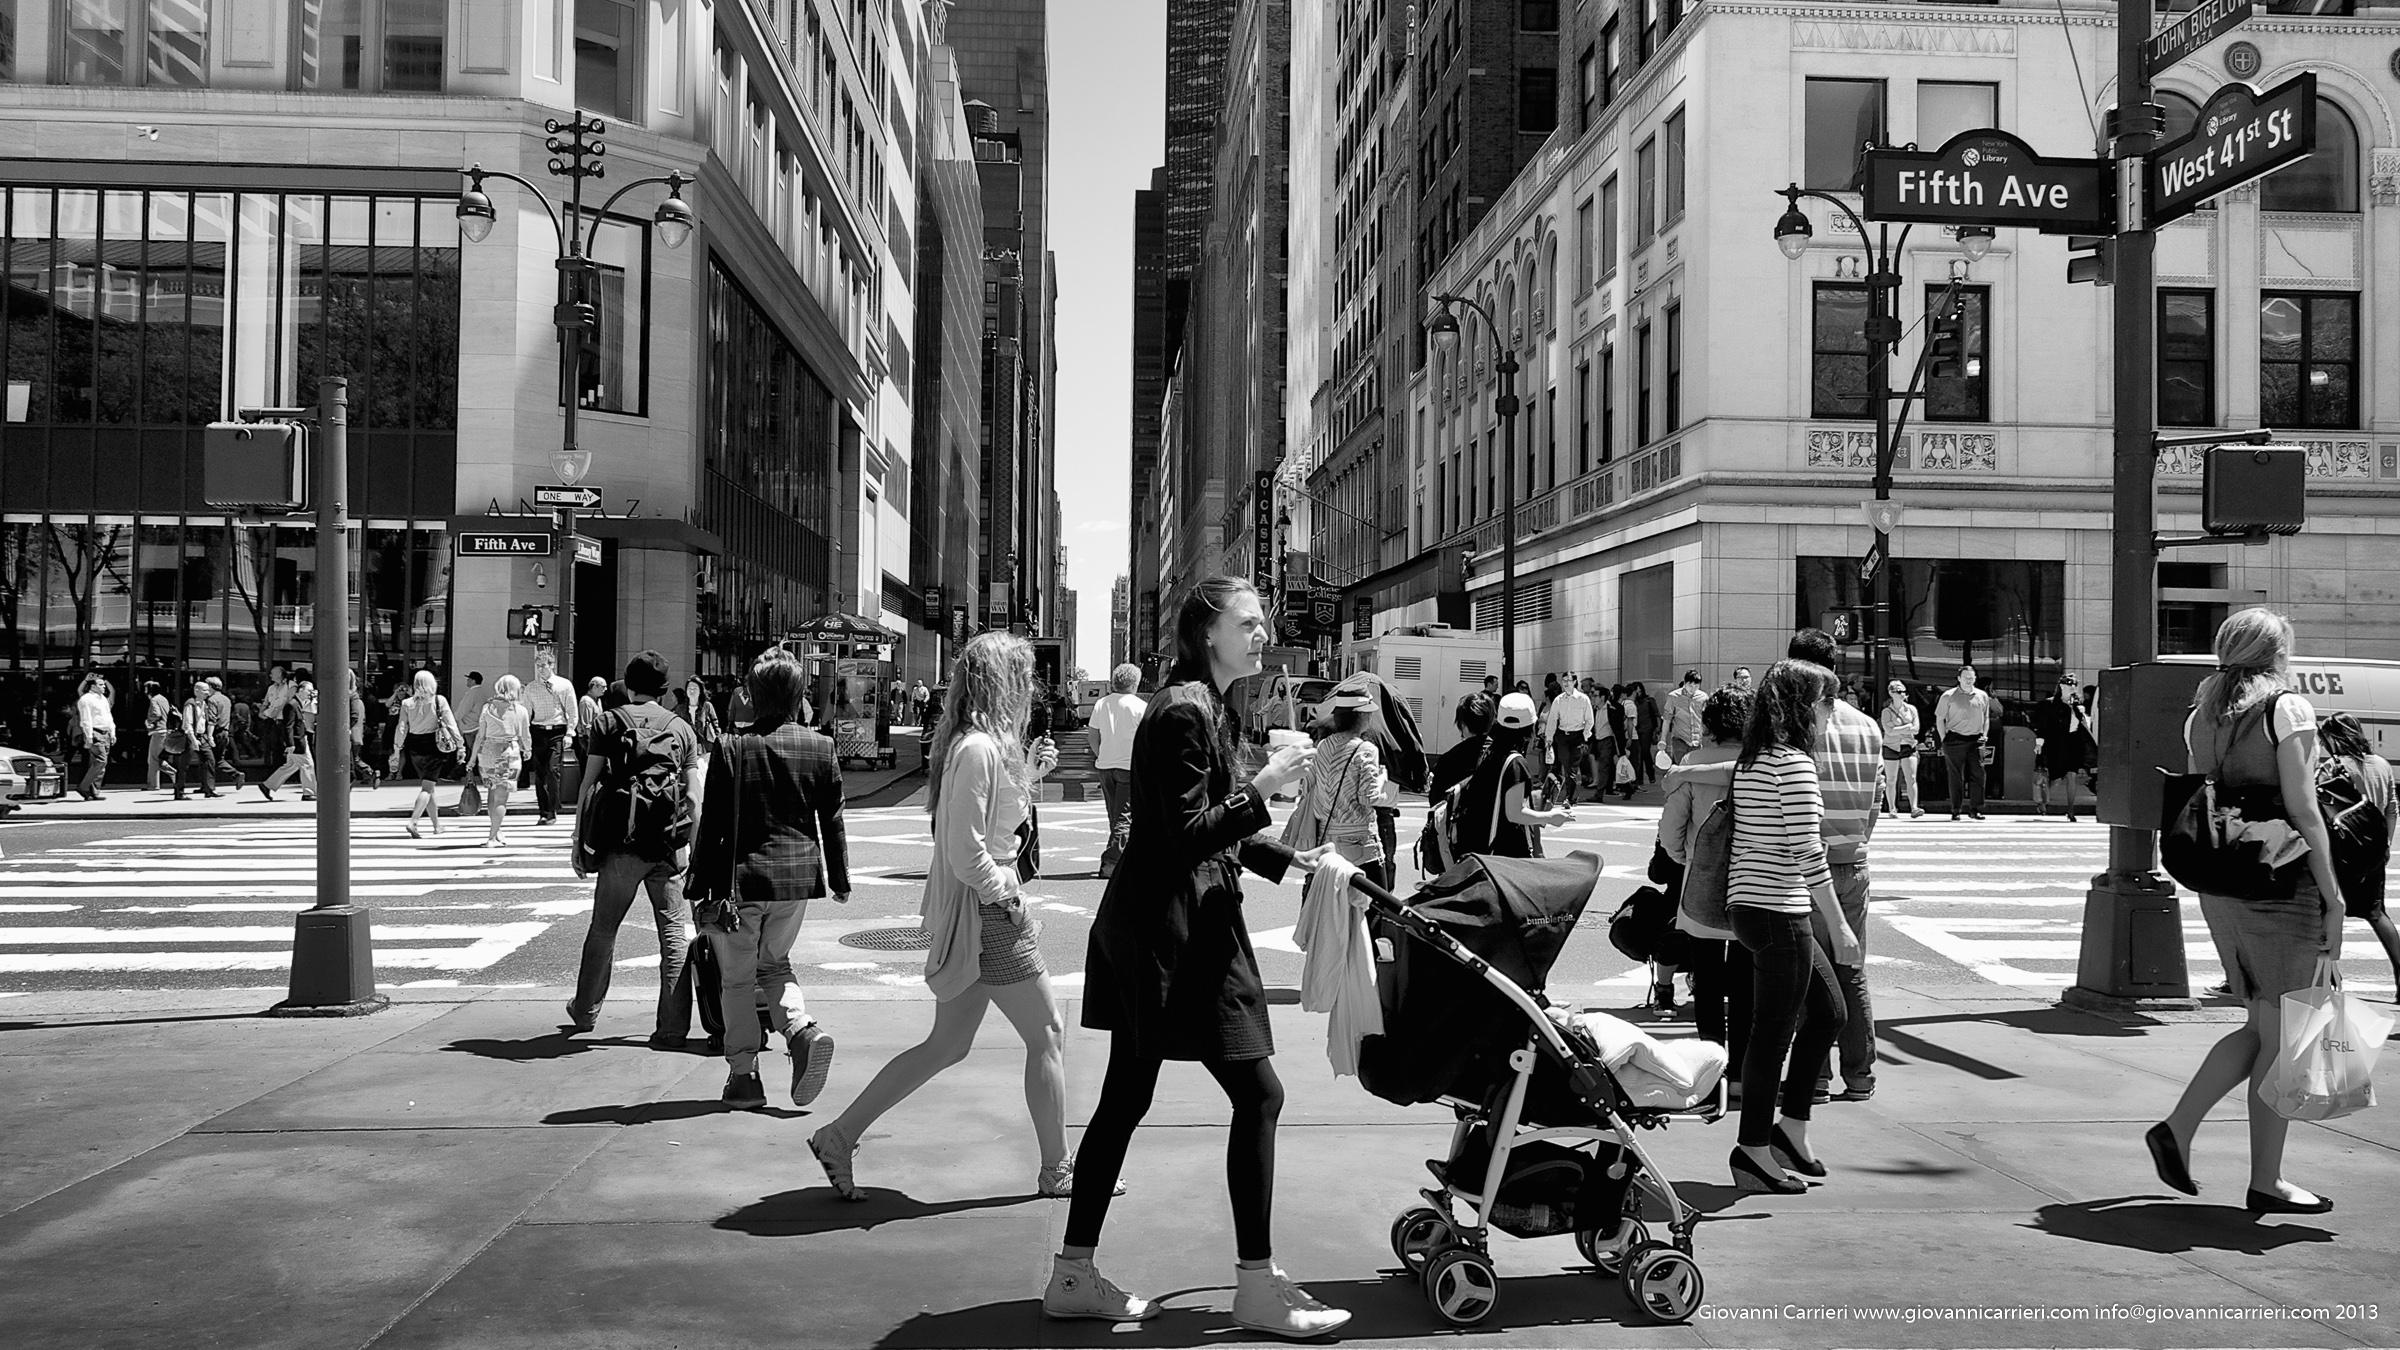 La quinta strada - Manhattan